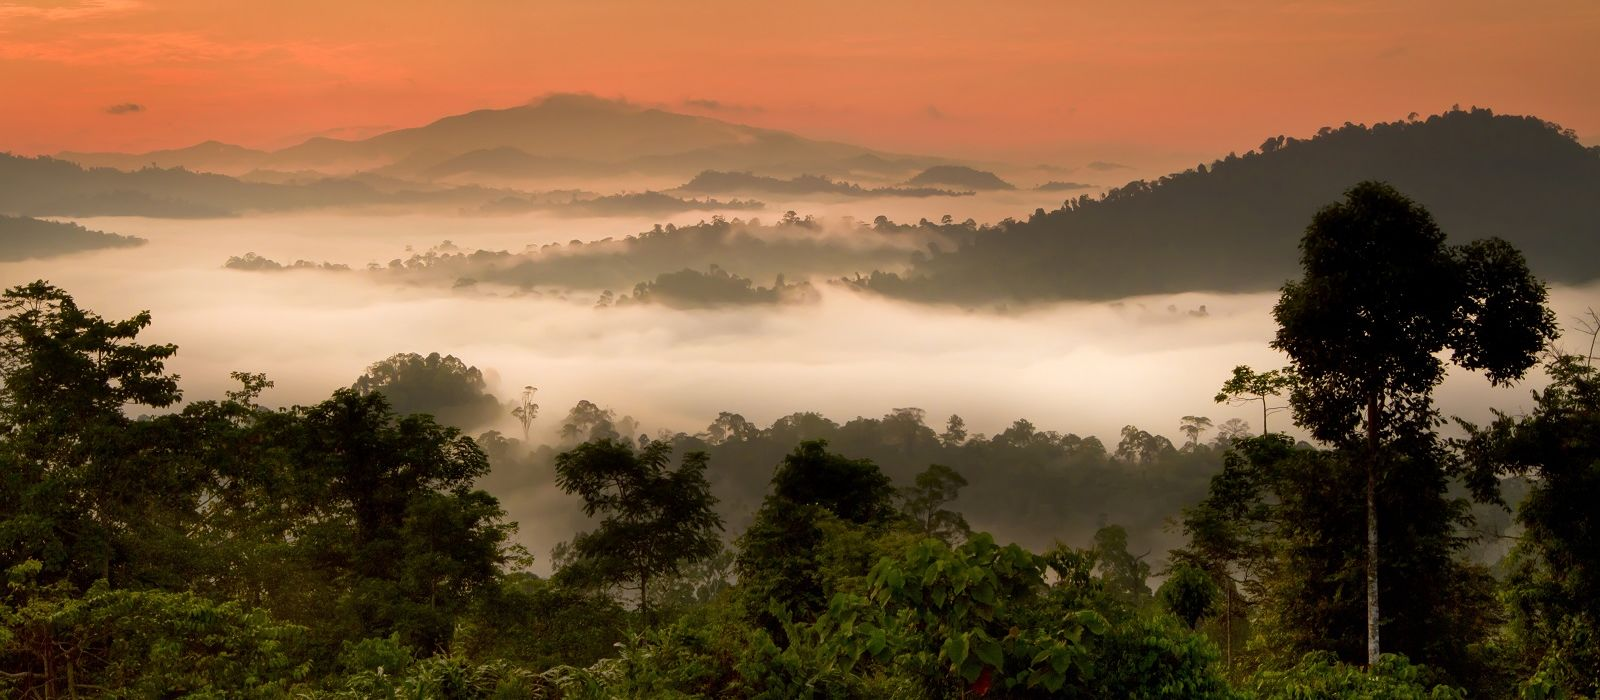 Wildnis und Strände Malaysias Urlaub 3